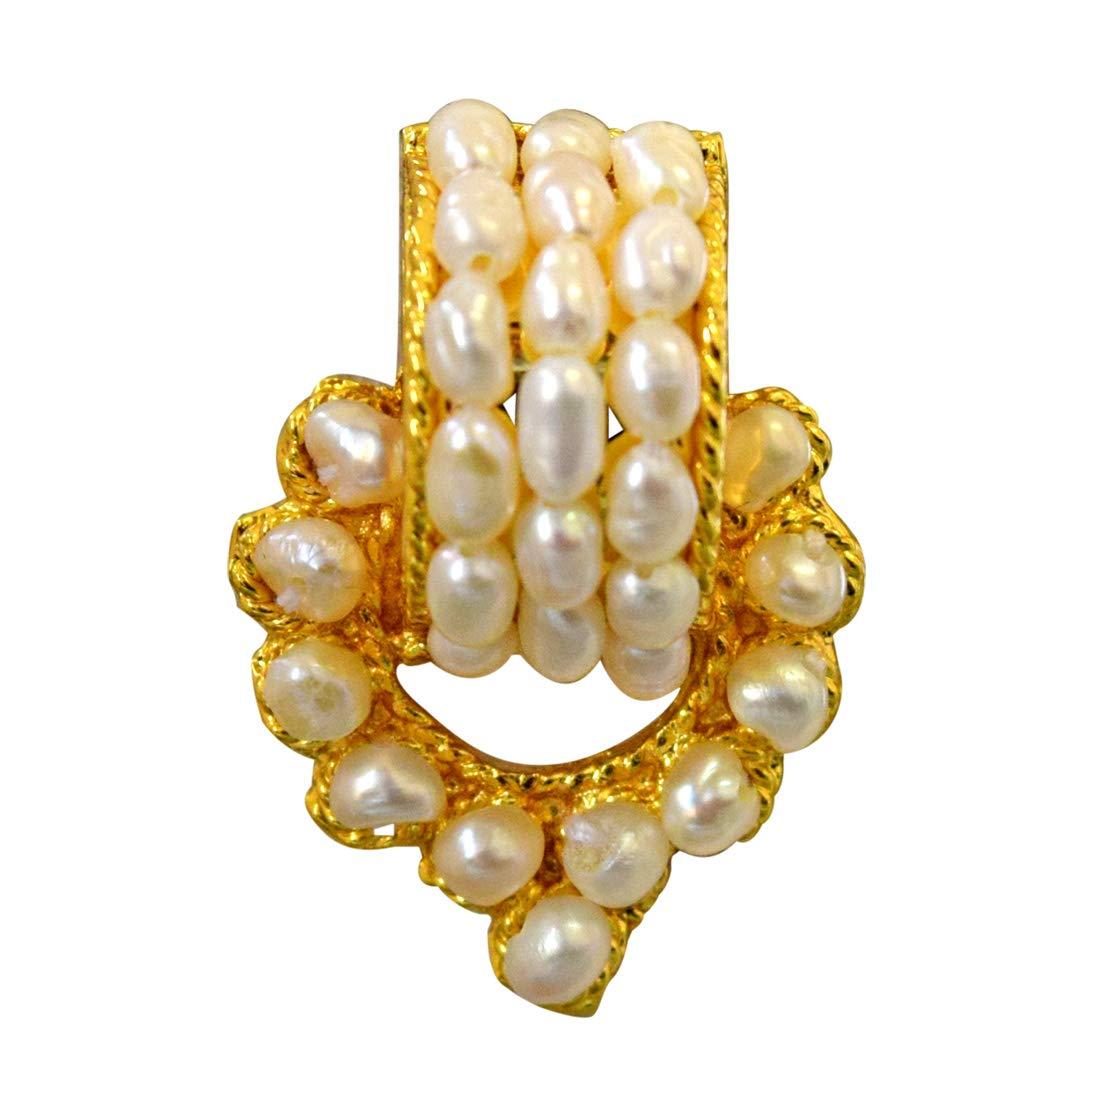 Geometric Magic - Real Freshwater Pearl & Gold Plated Geometrical Shaped Earring for Women (SE40)